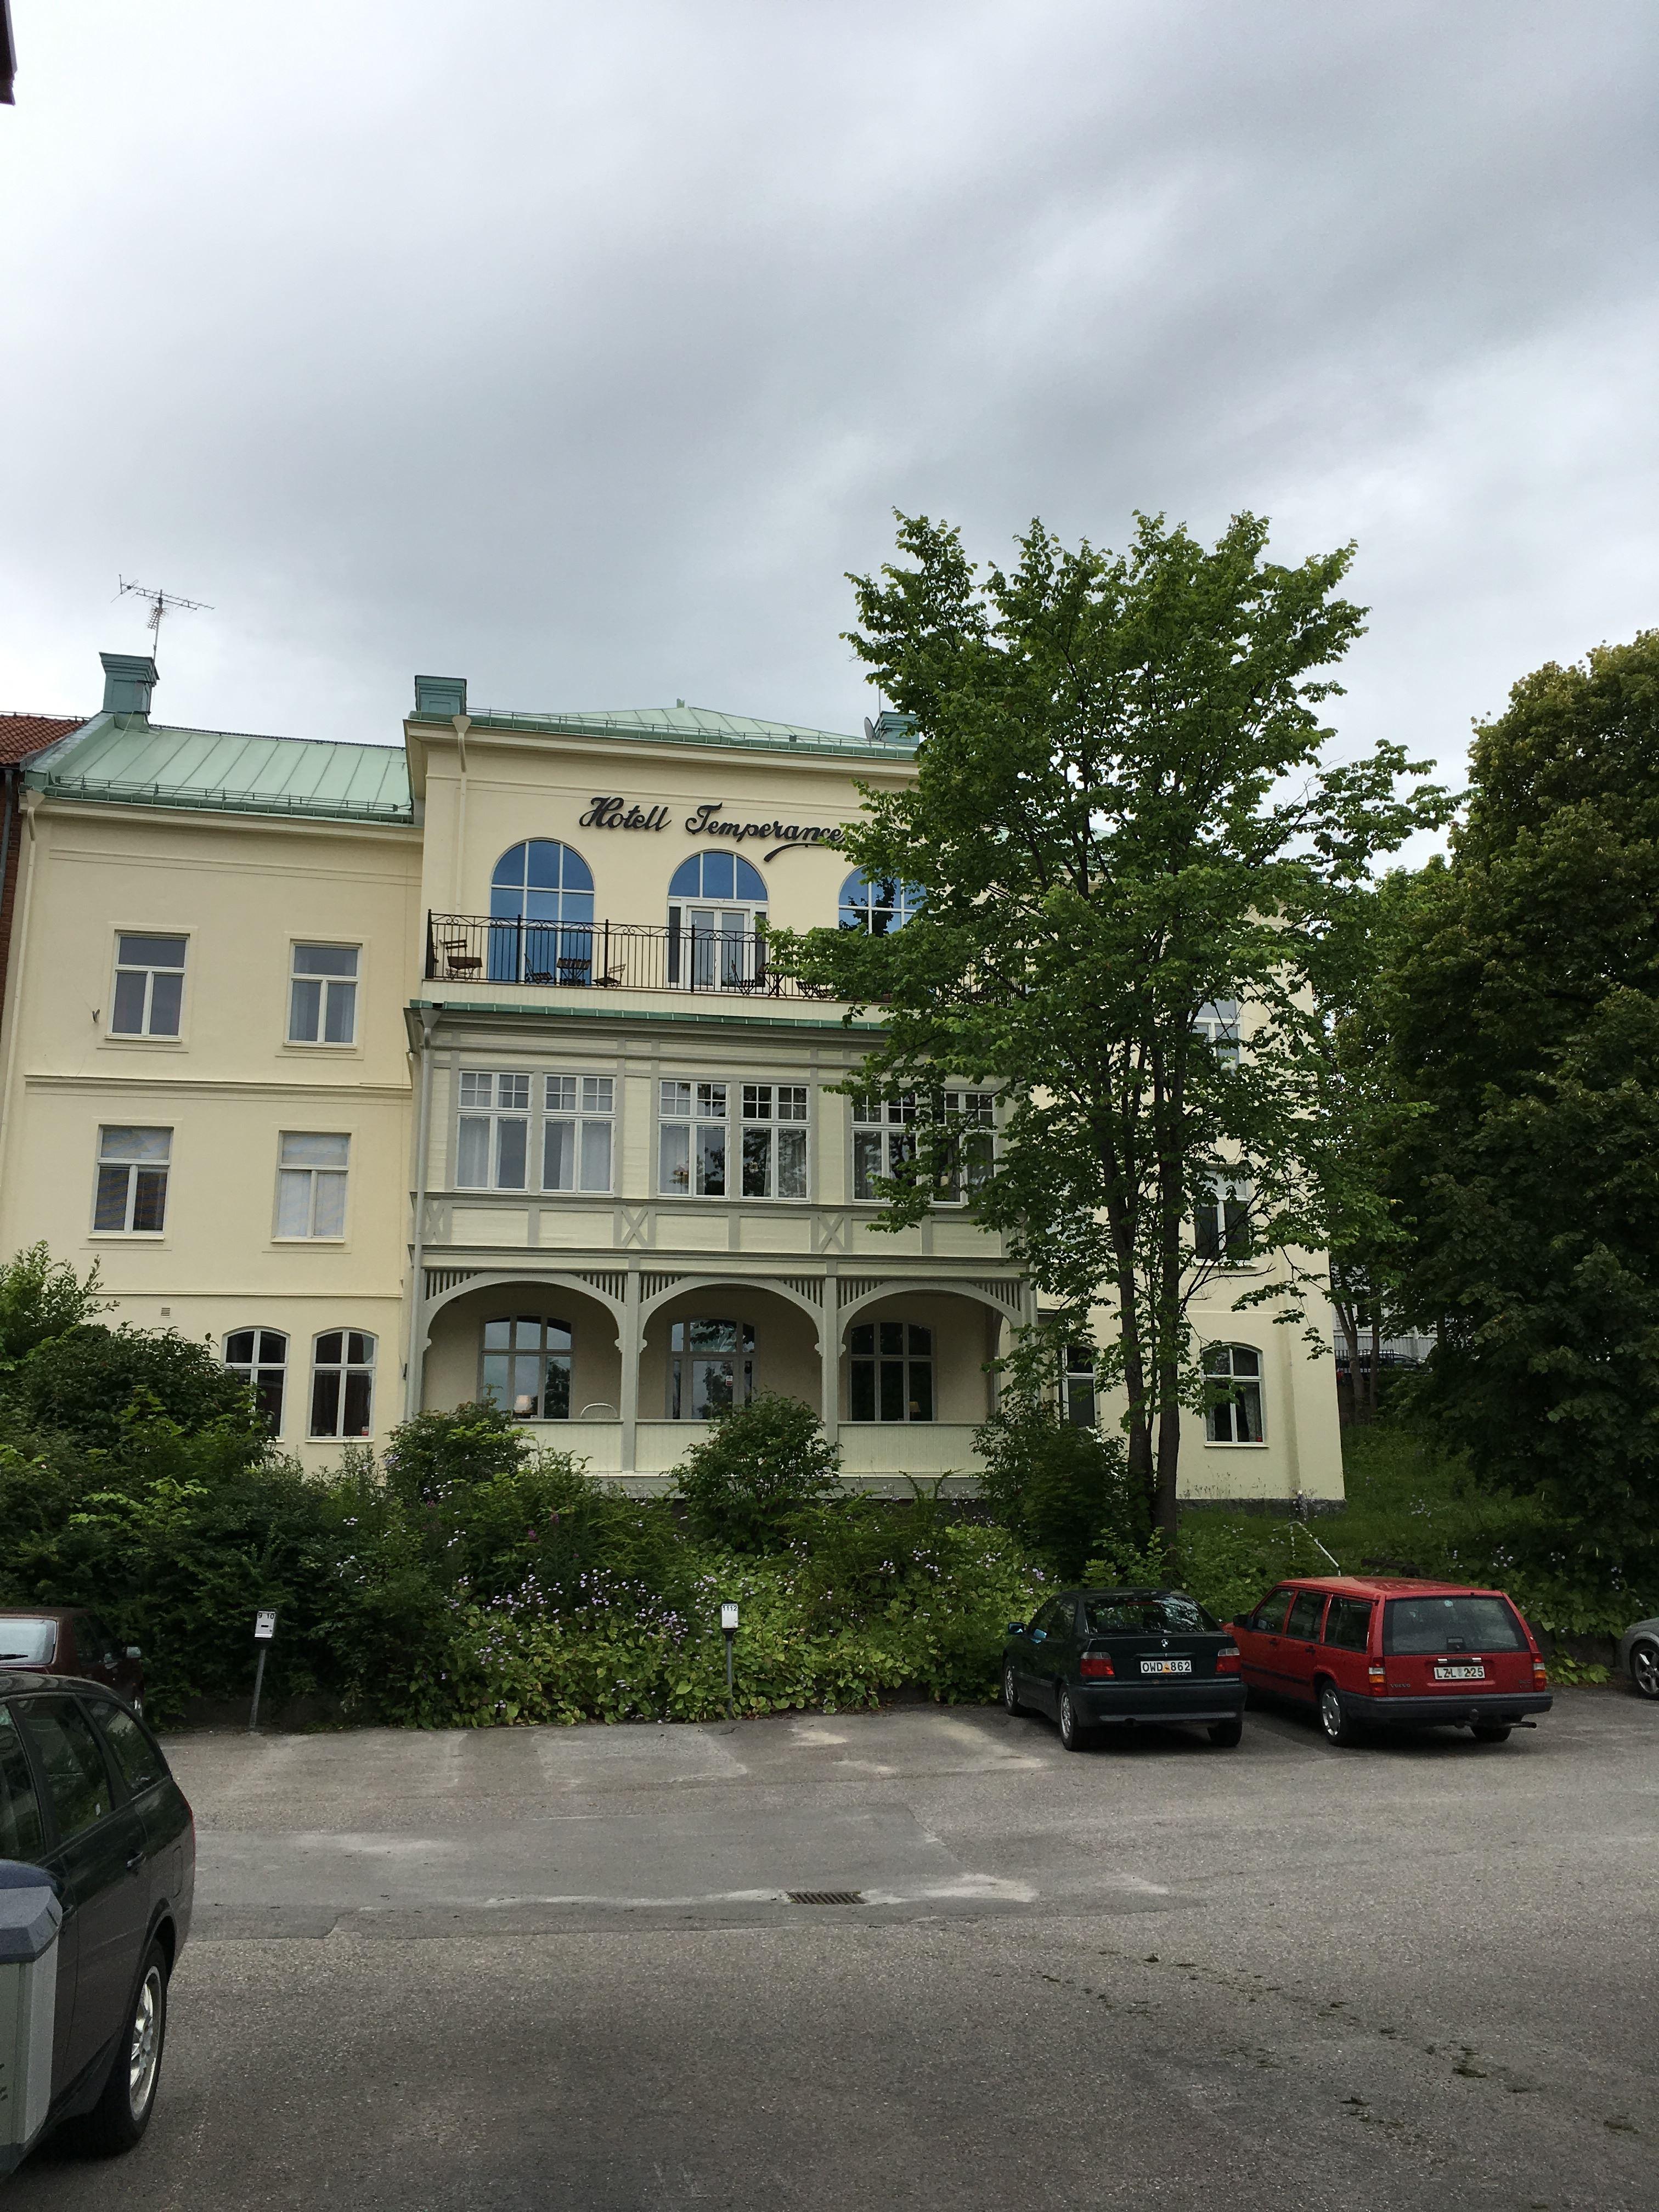 Lena E Andersson, Fasad mot parkering